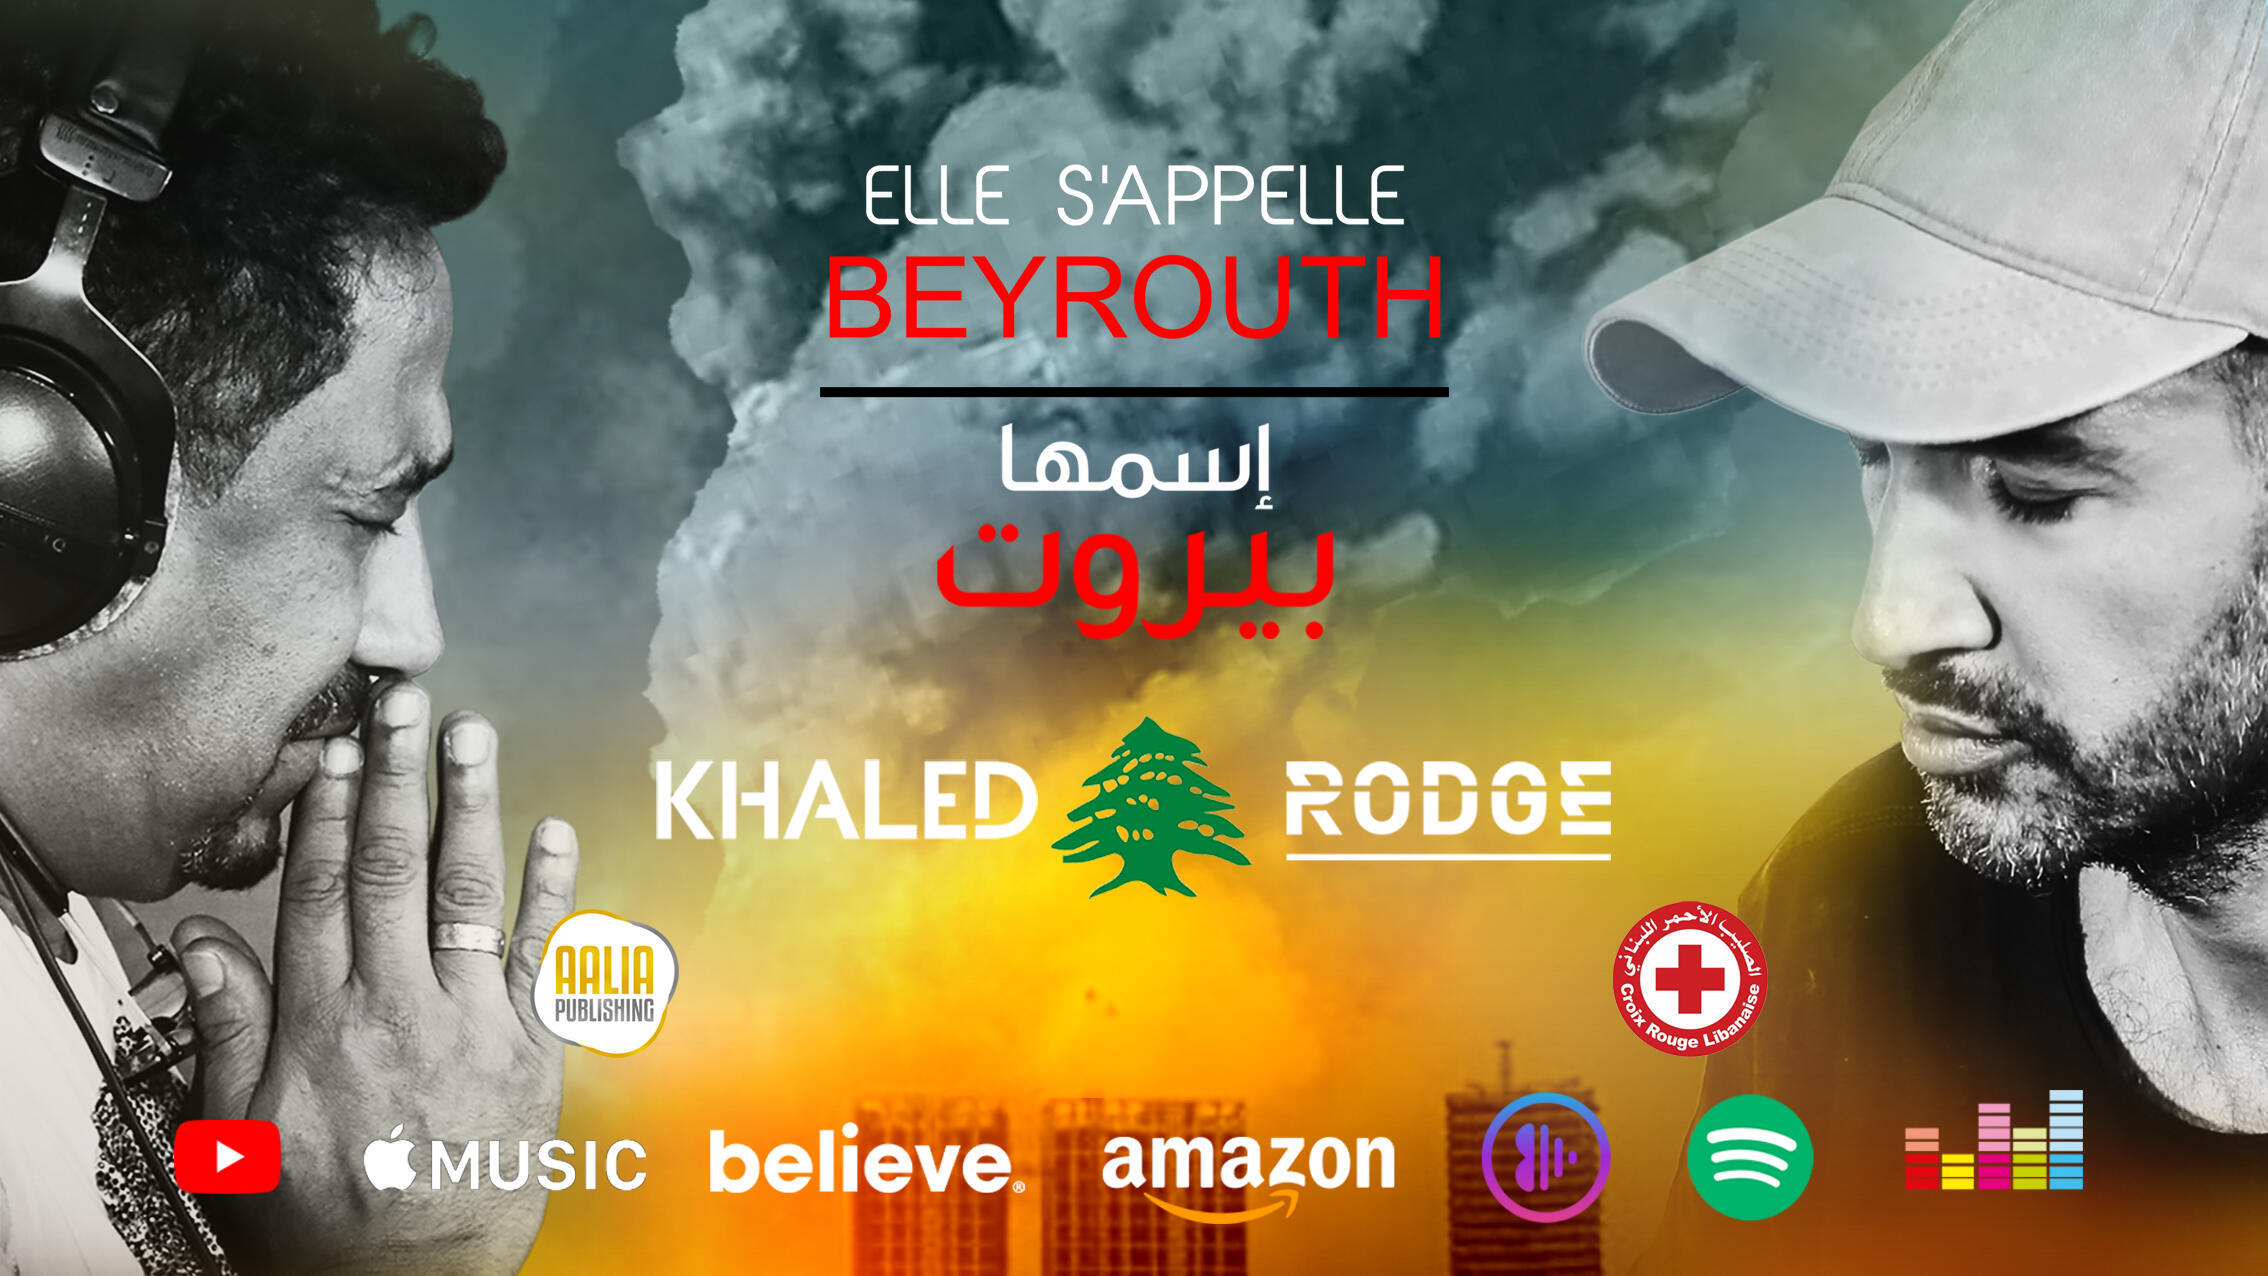 Elle s'appelle Beyrouth